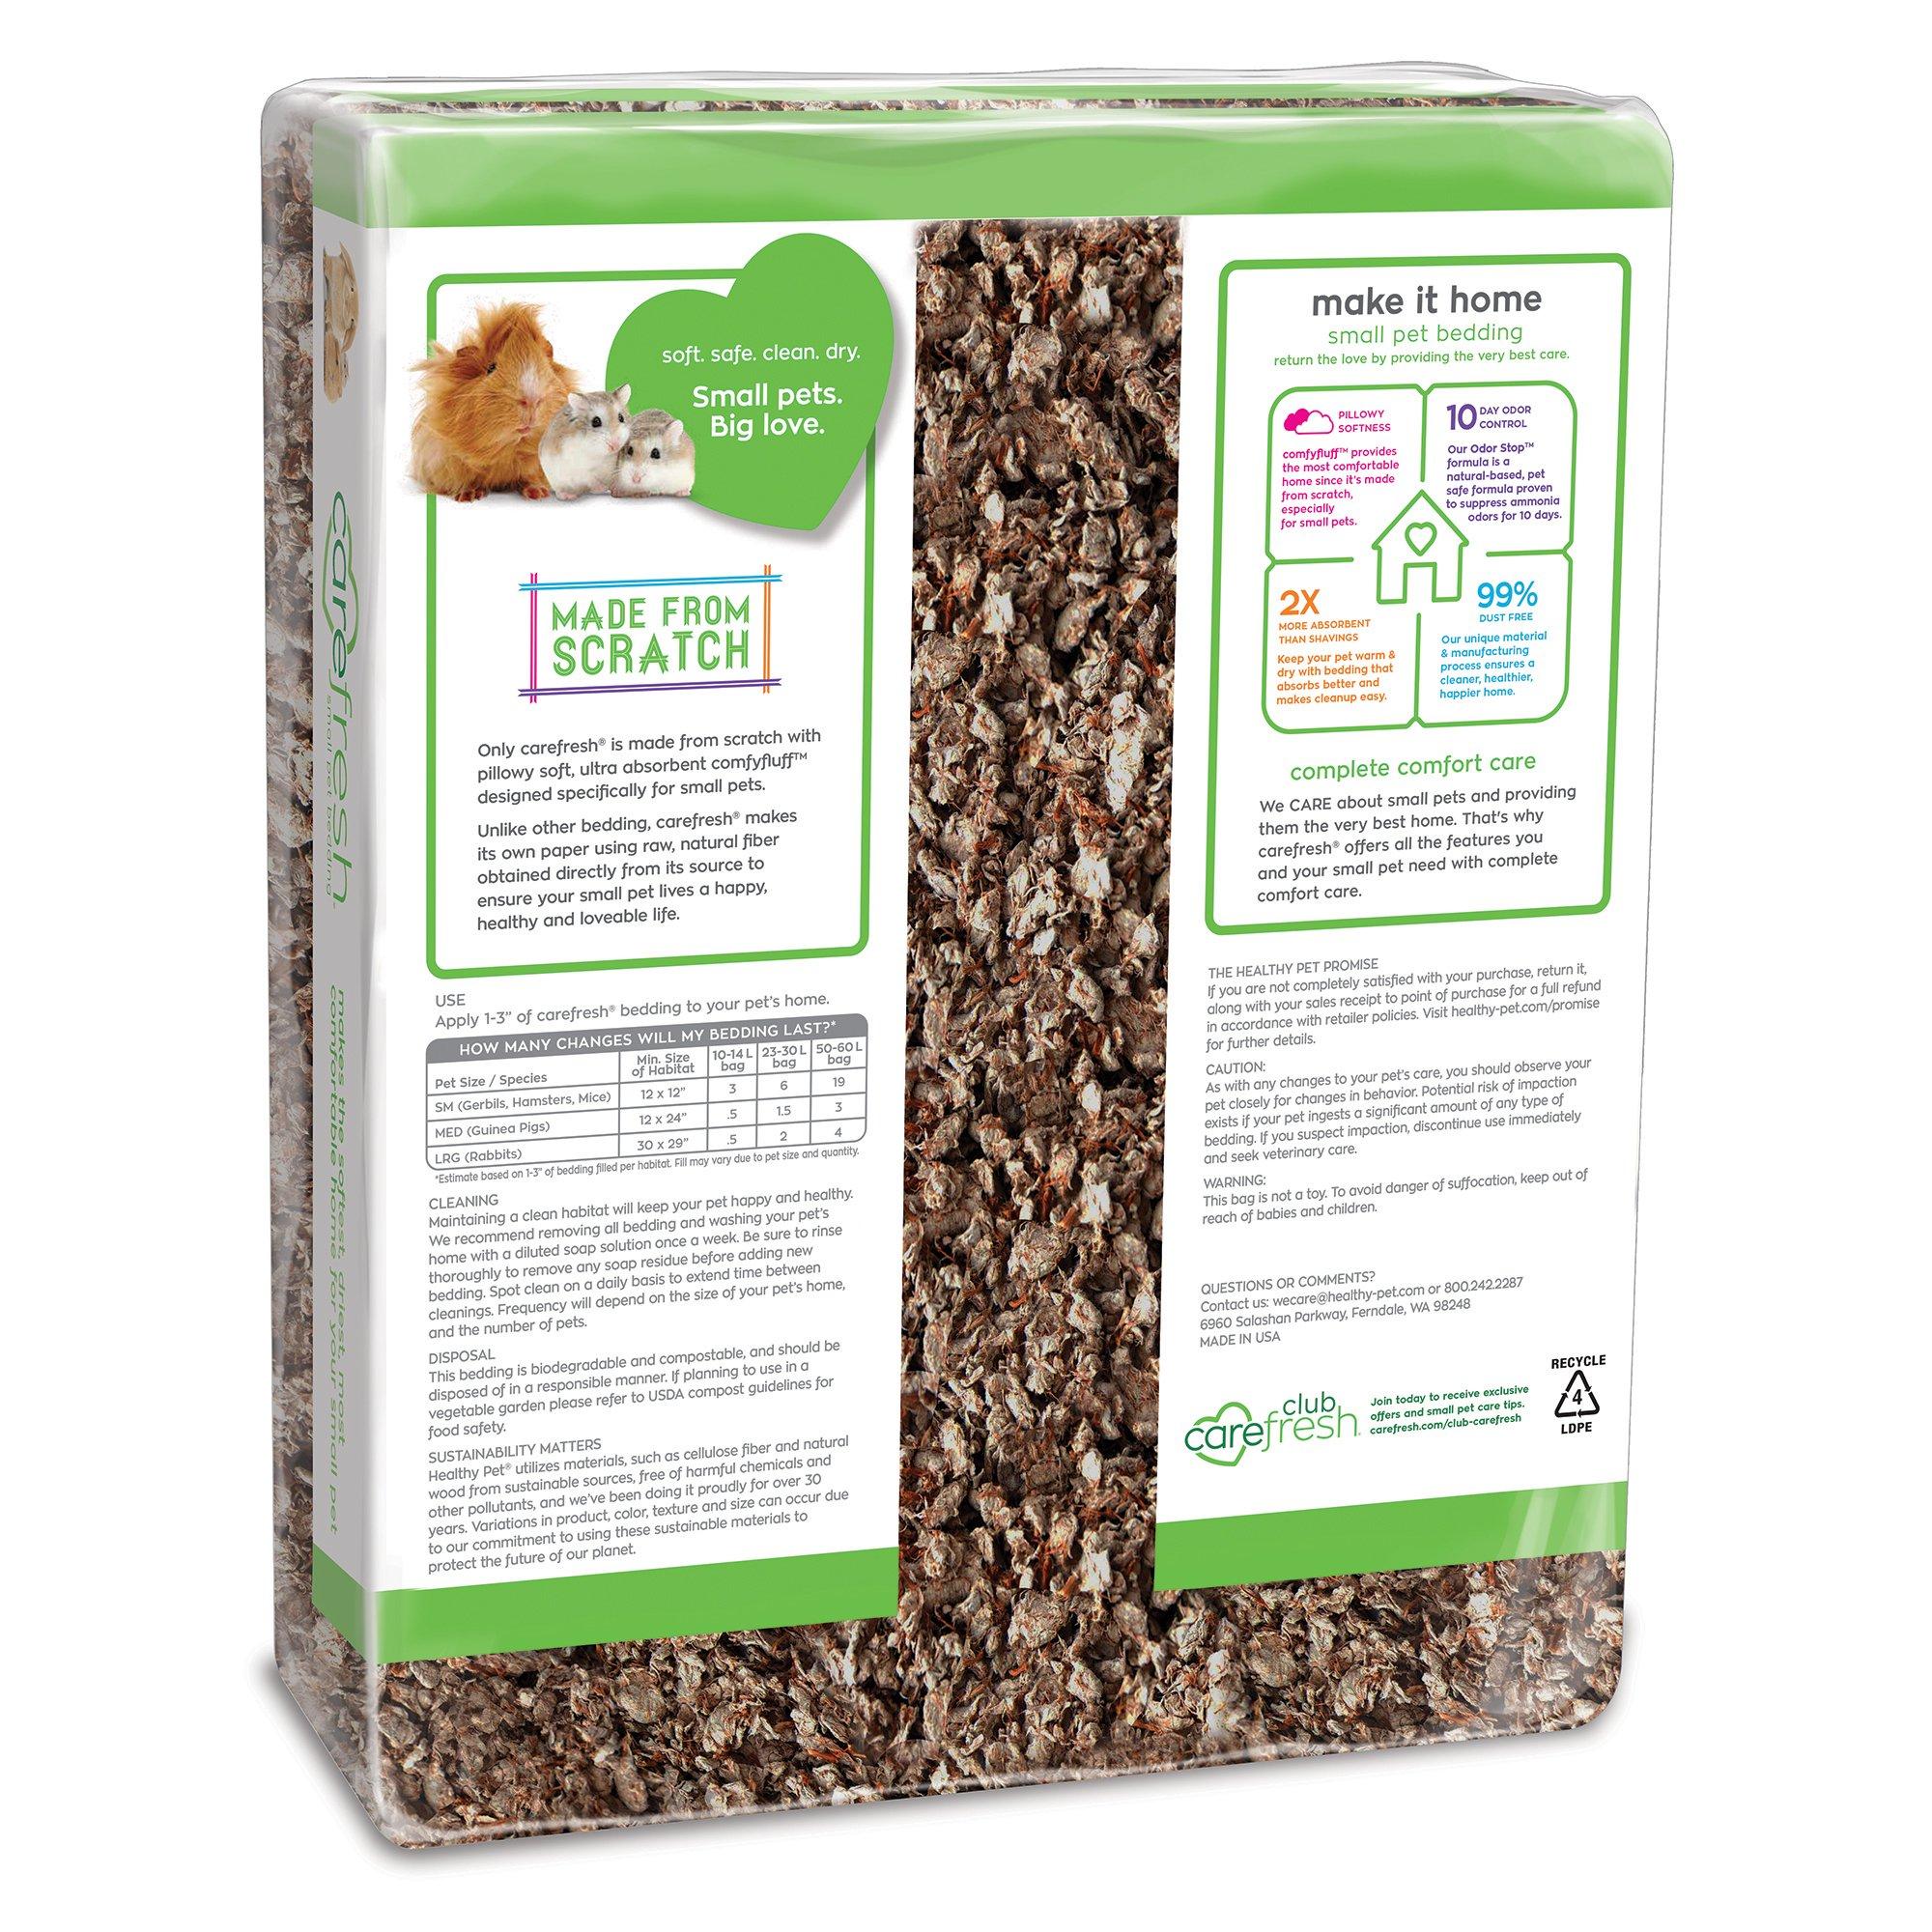 Carefresh Natural Small Pet Bedding, 60 liters Petco